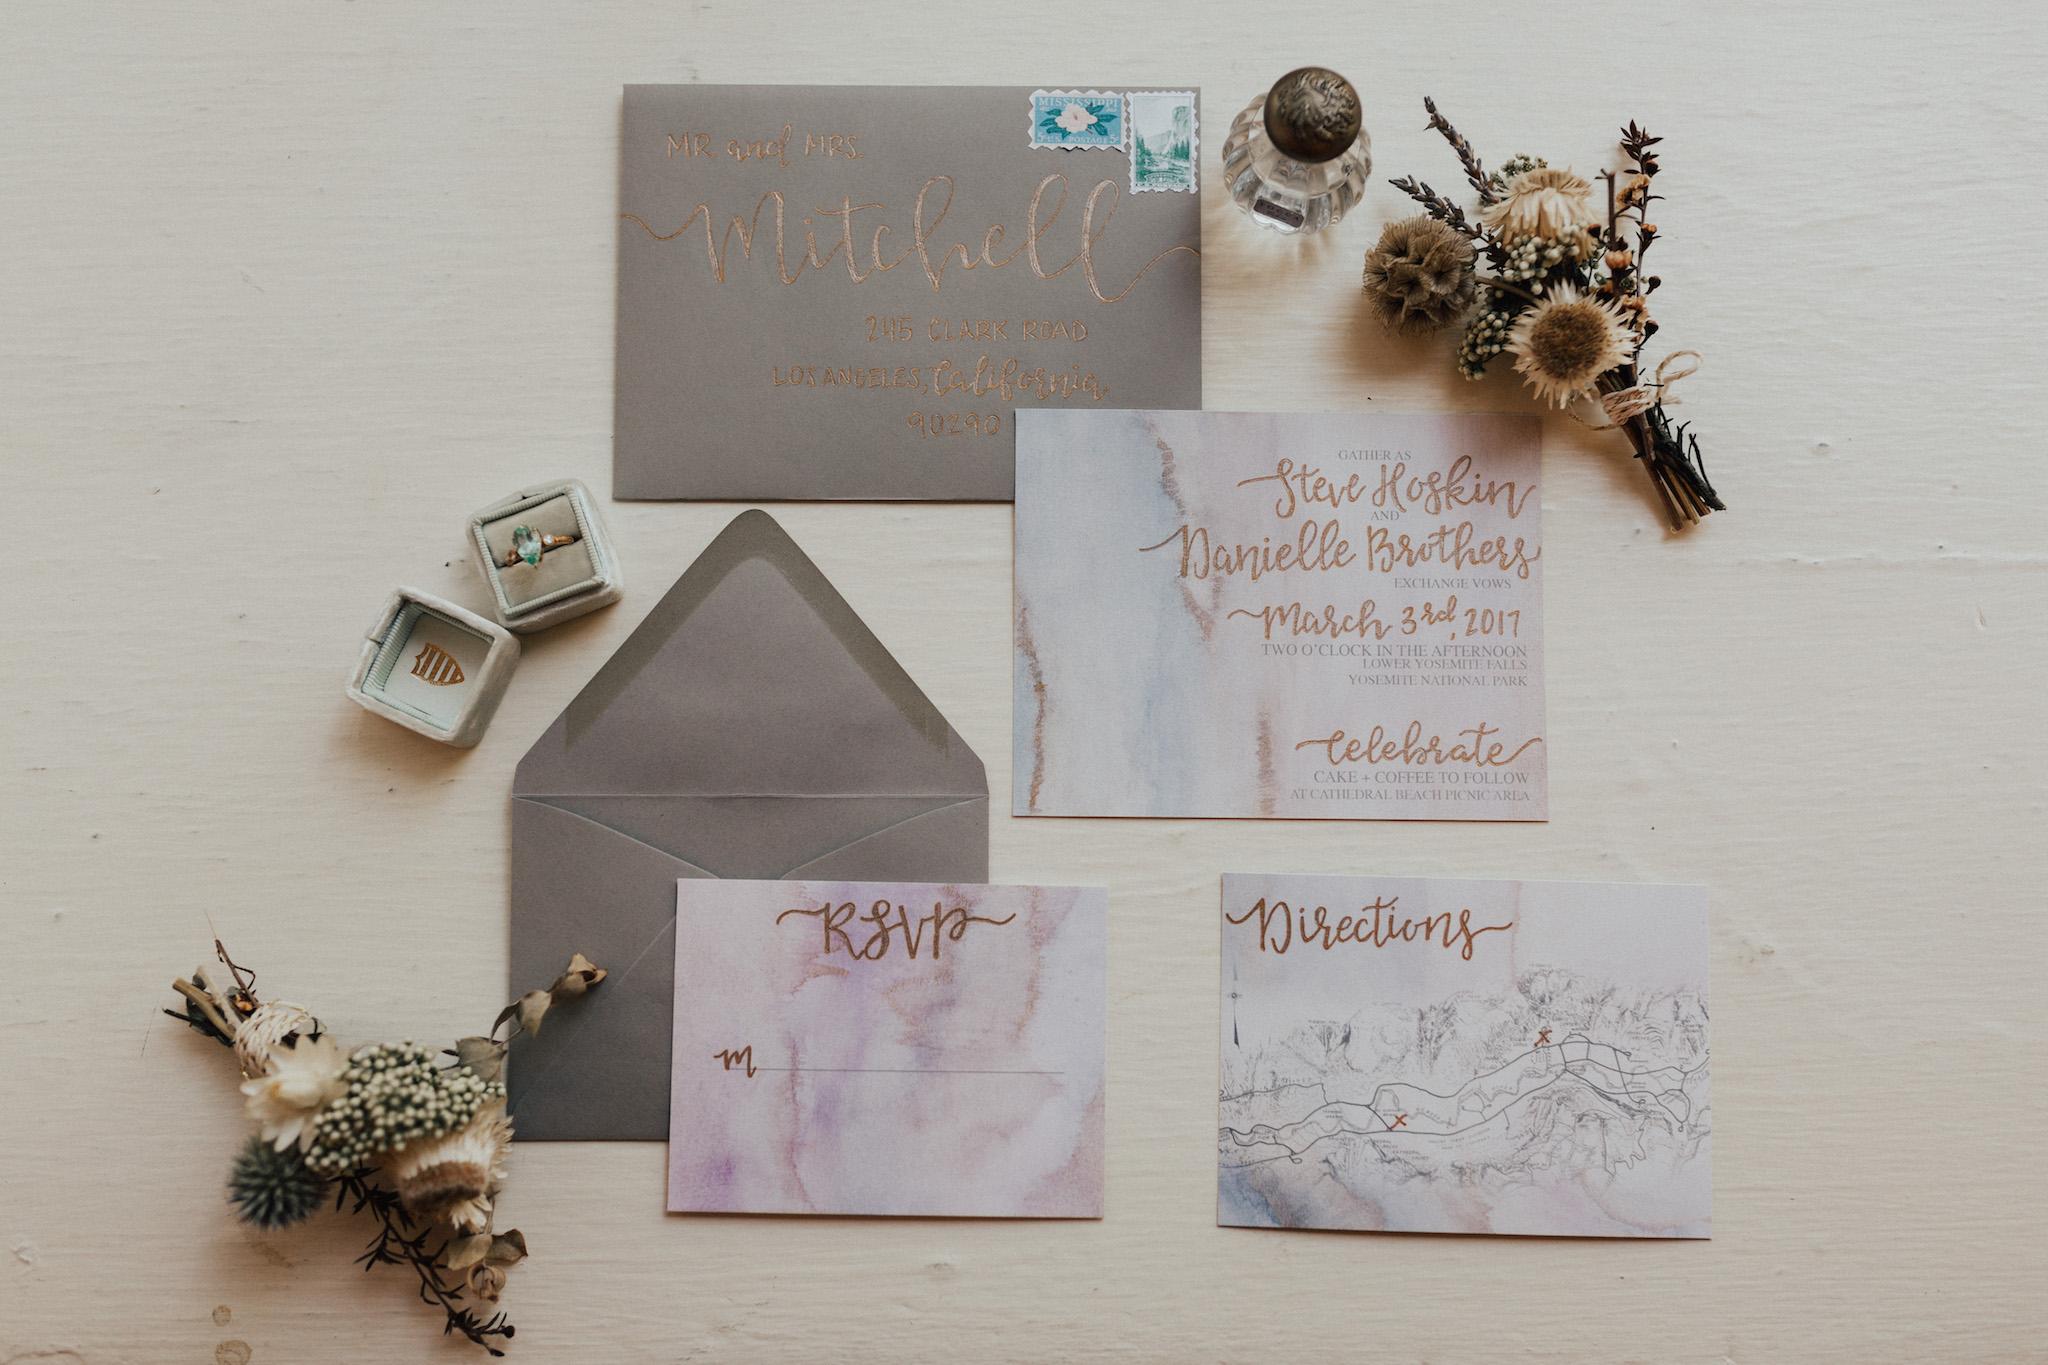 yosemite-wedding-invitation.JPG